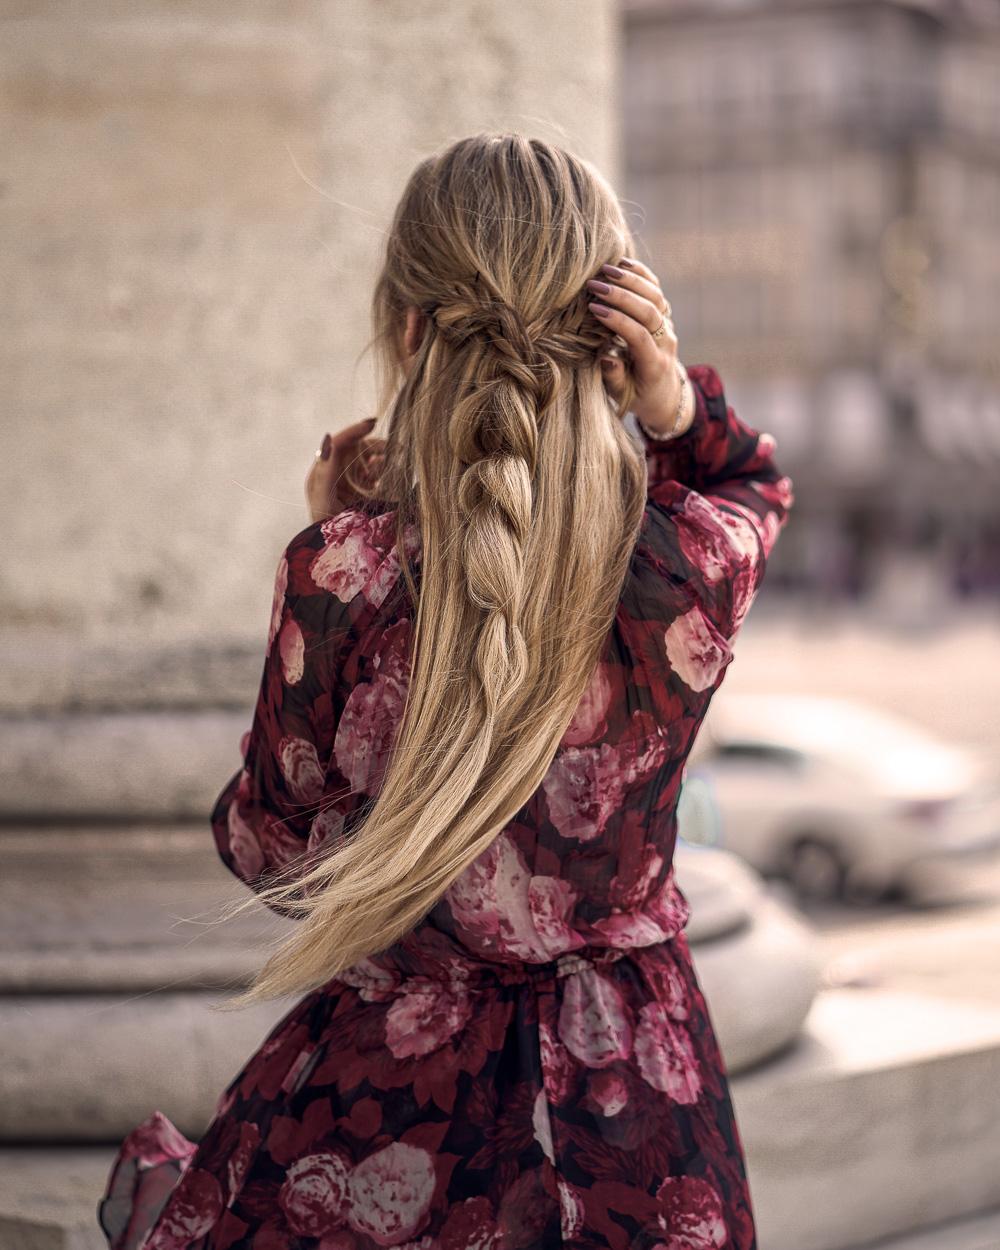 Rosenmuster Kleid von Nakd